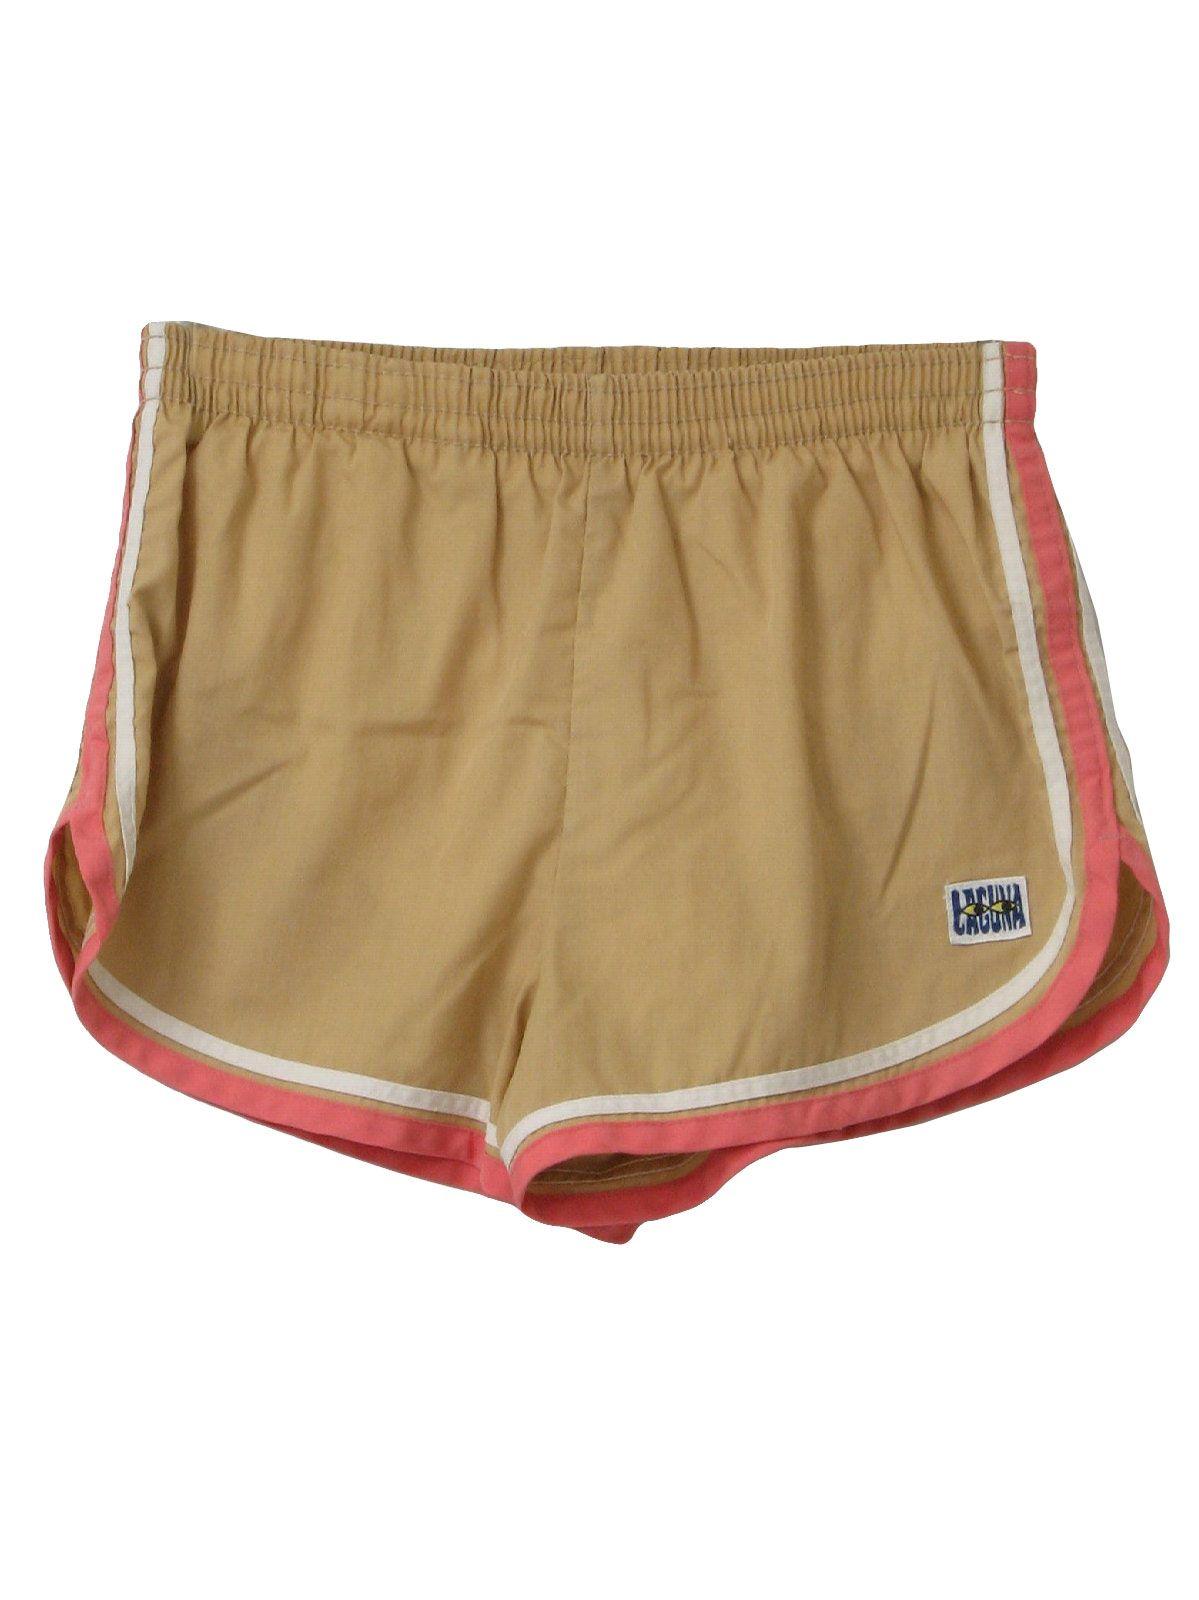 9992261d91cf9 1980's Laguna Mens Totally 80s Swim Shorts in 2019 | 1986 men's ...